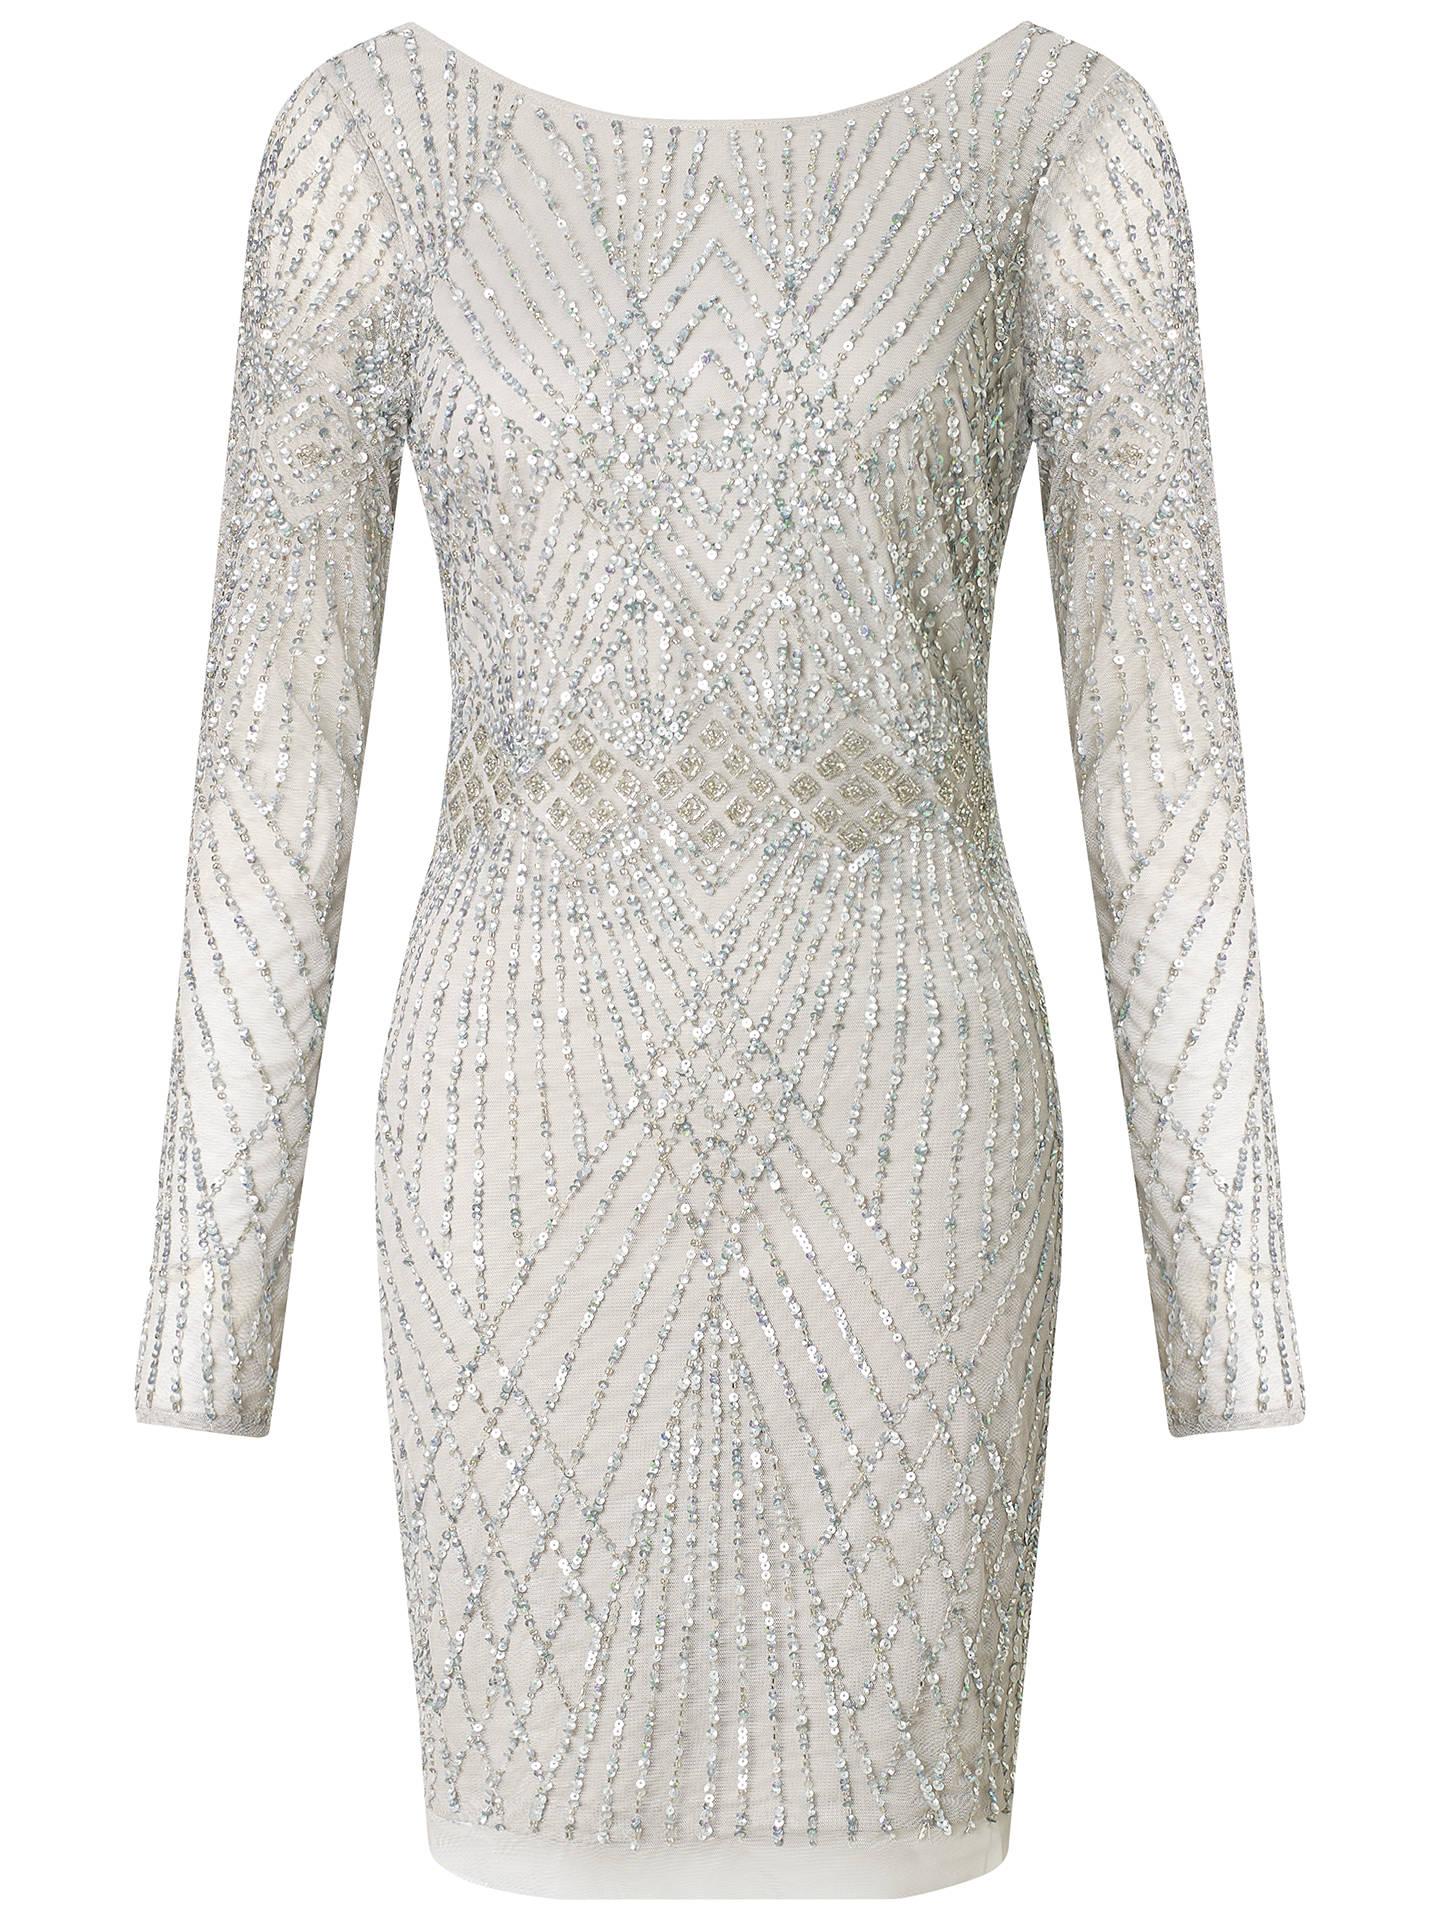 a955c09b65a Buy Aidan Mattox Long Sleeve Beaded Cocktail Dress